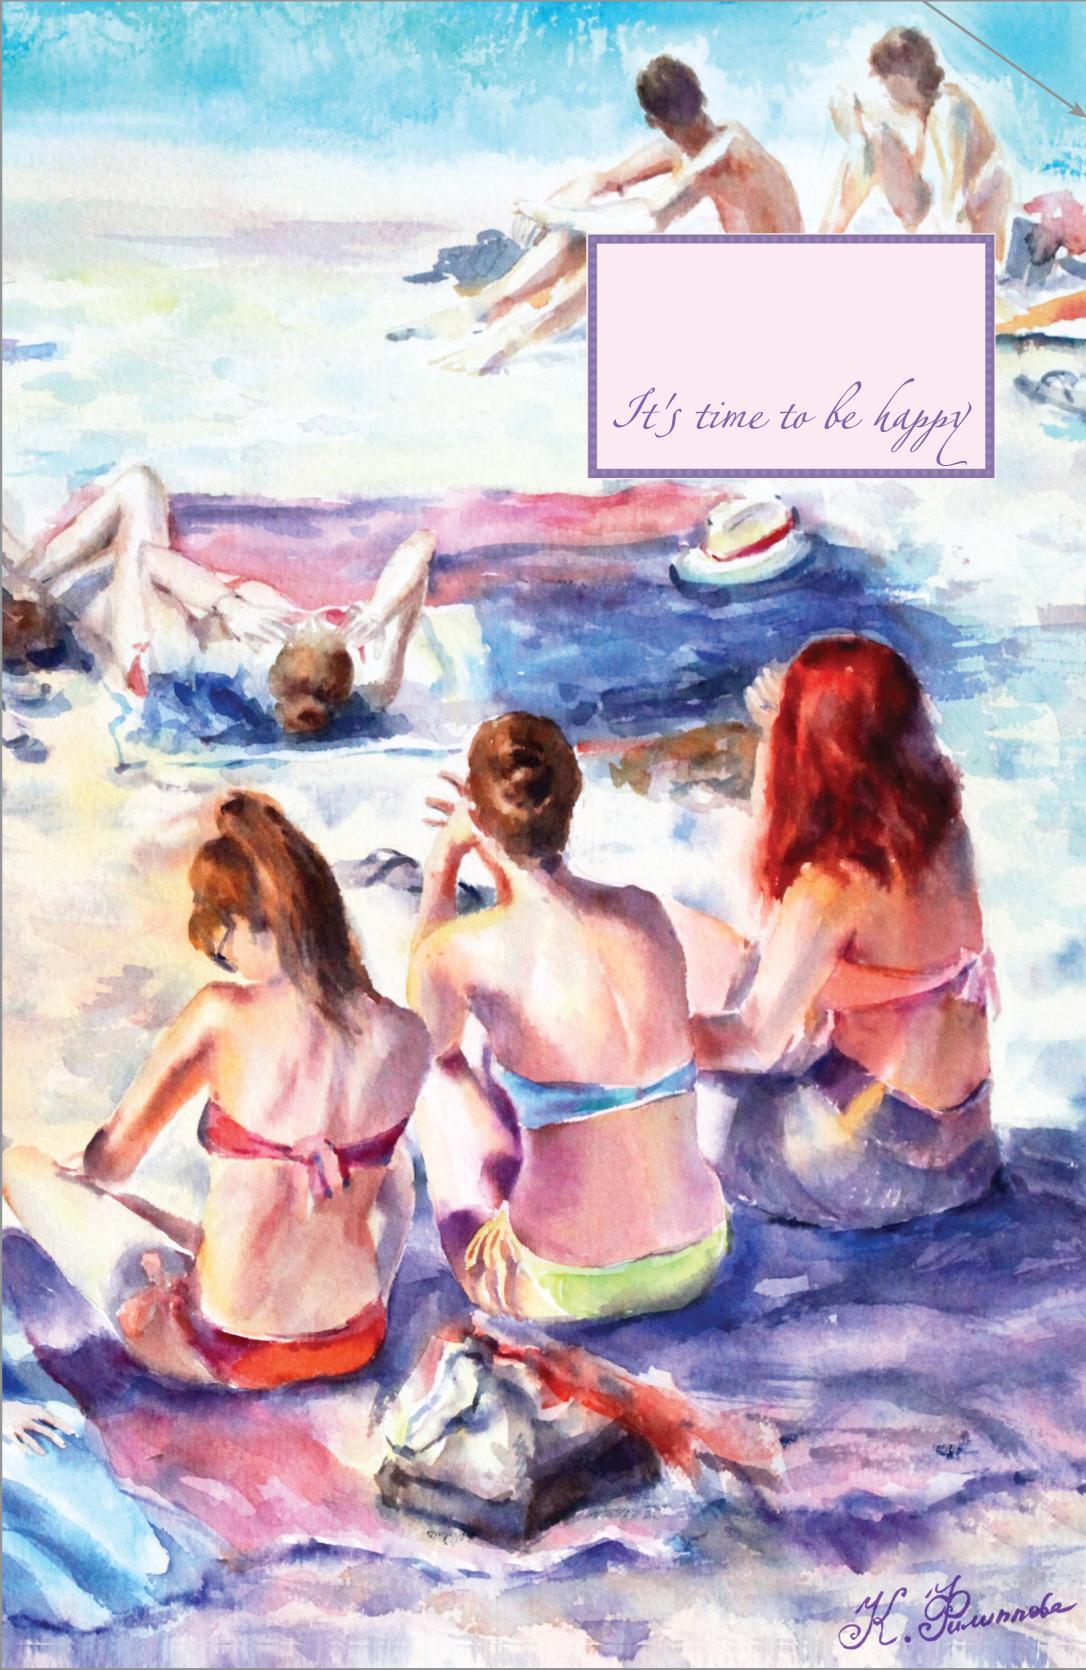 Француженки на пляже. Блокнот для записей